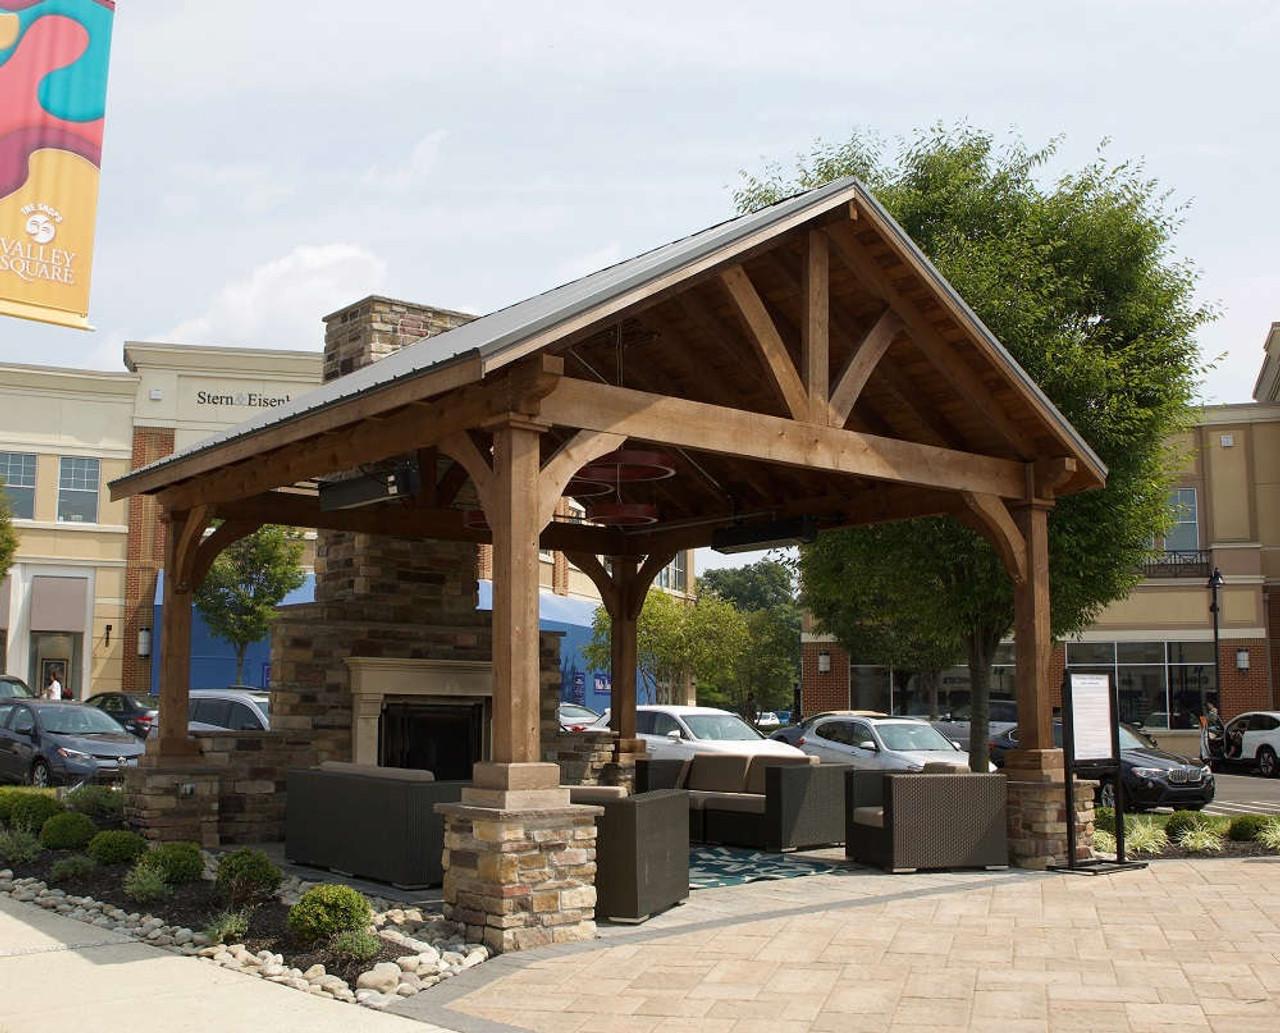 18x18 Grand Cedar Pavilion Kit with Mahogany stain, Warrington, PA